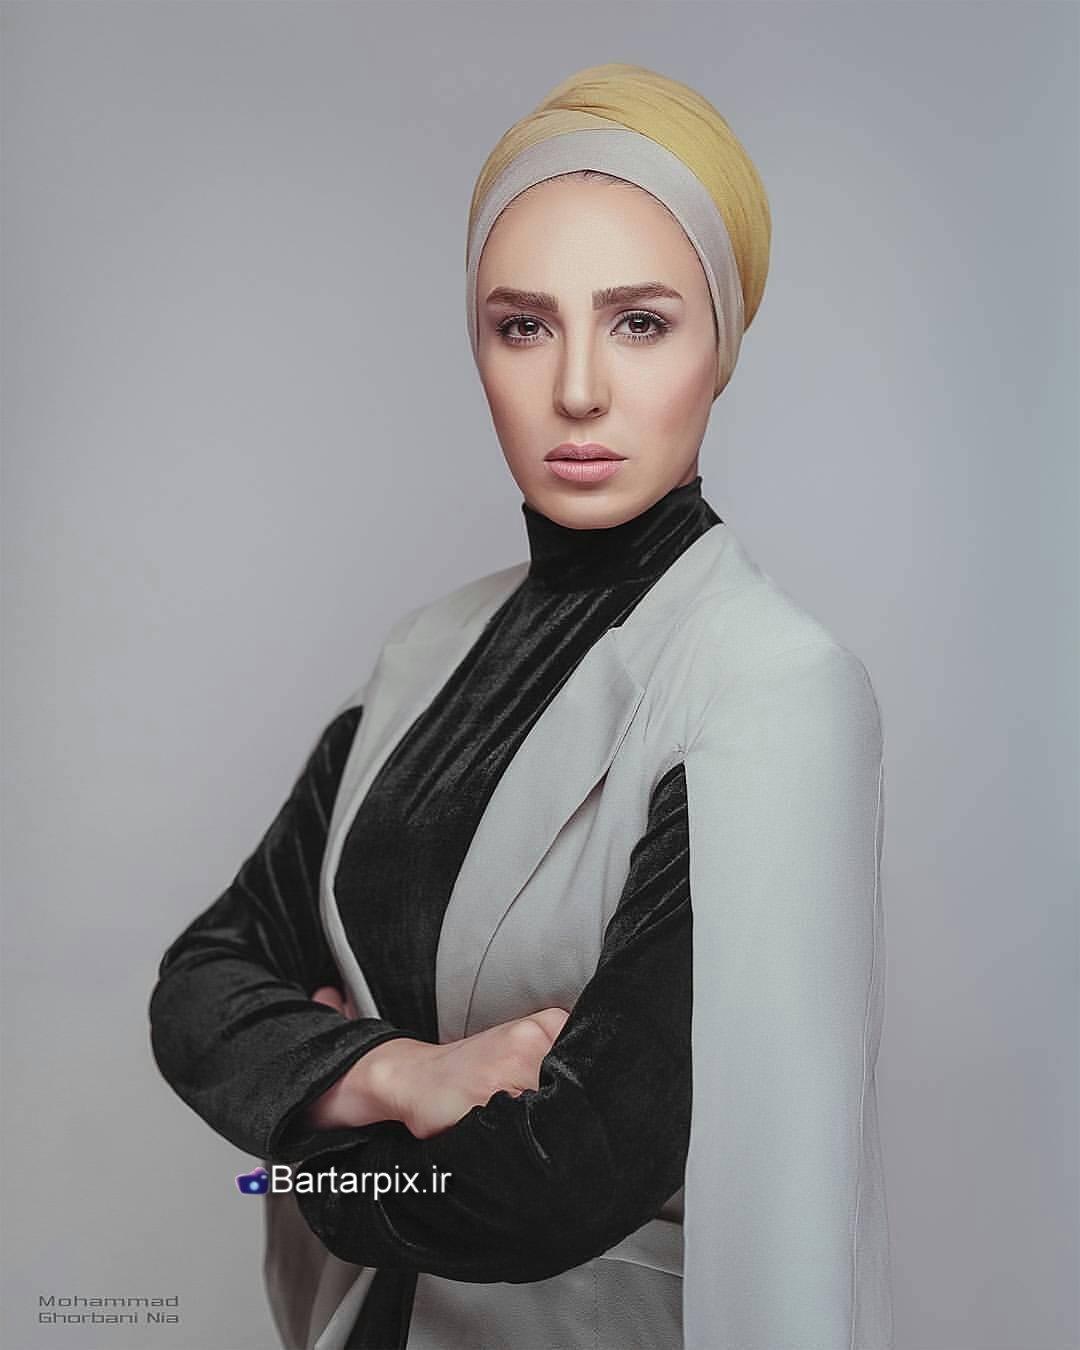 http://s2.picofile.com/file/8262927034/www_bartarpix_ir_sogol_tahmasebi_mordad_95.jpg